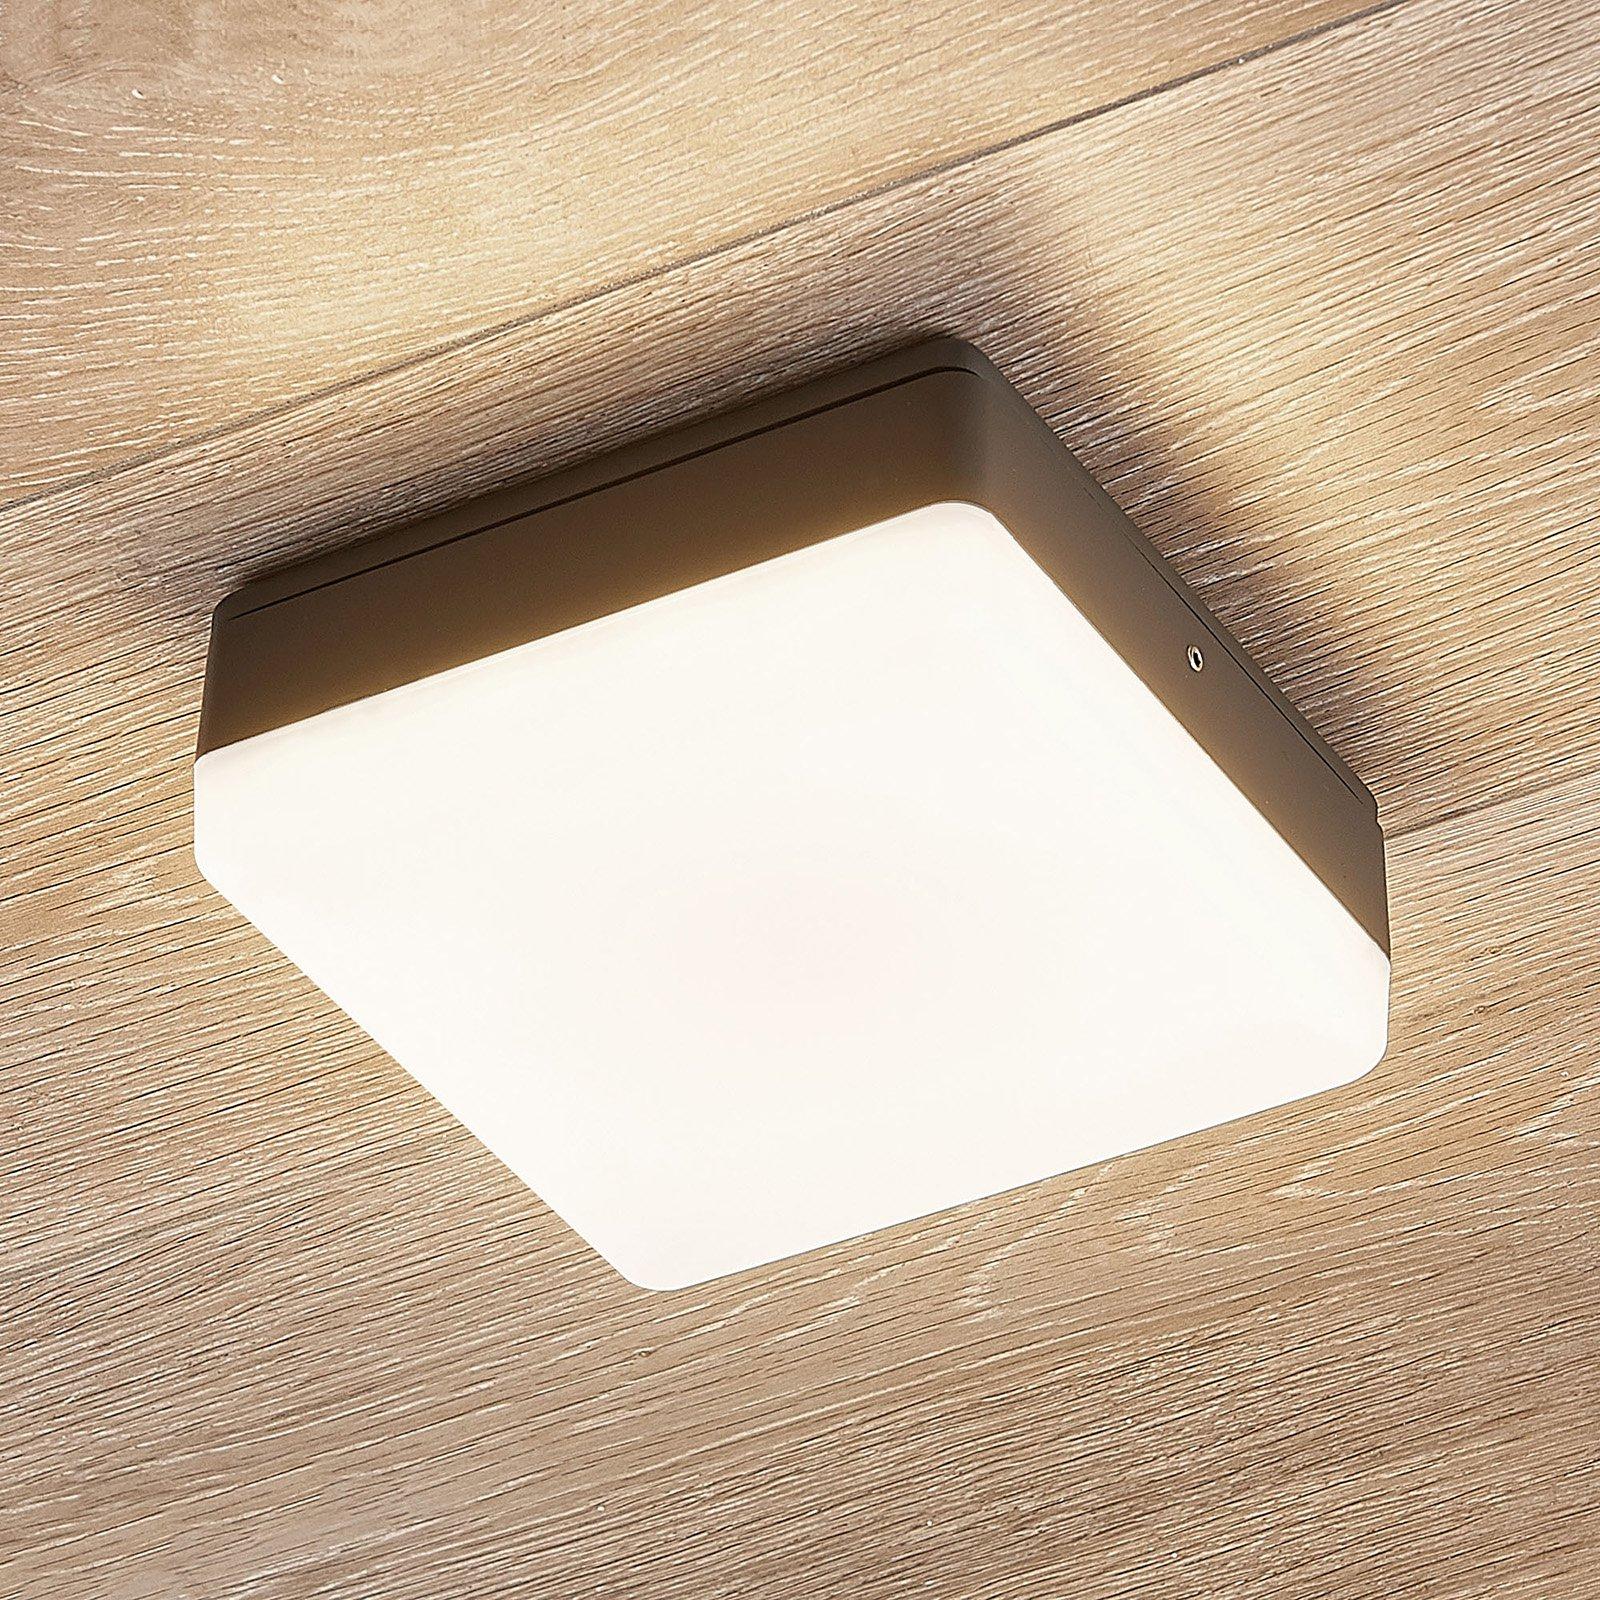 LED-taklampe Thilo, IP54, grå, 16 cm, HF-sensor